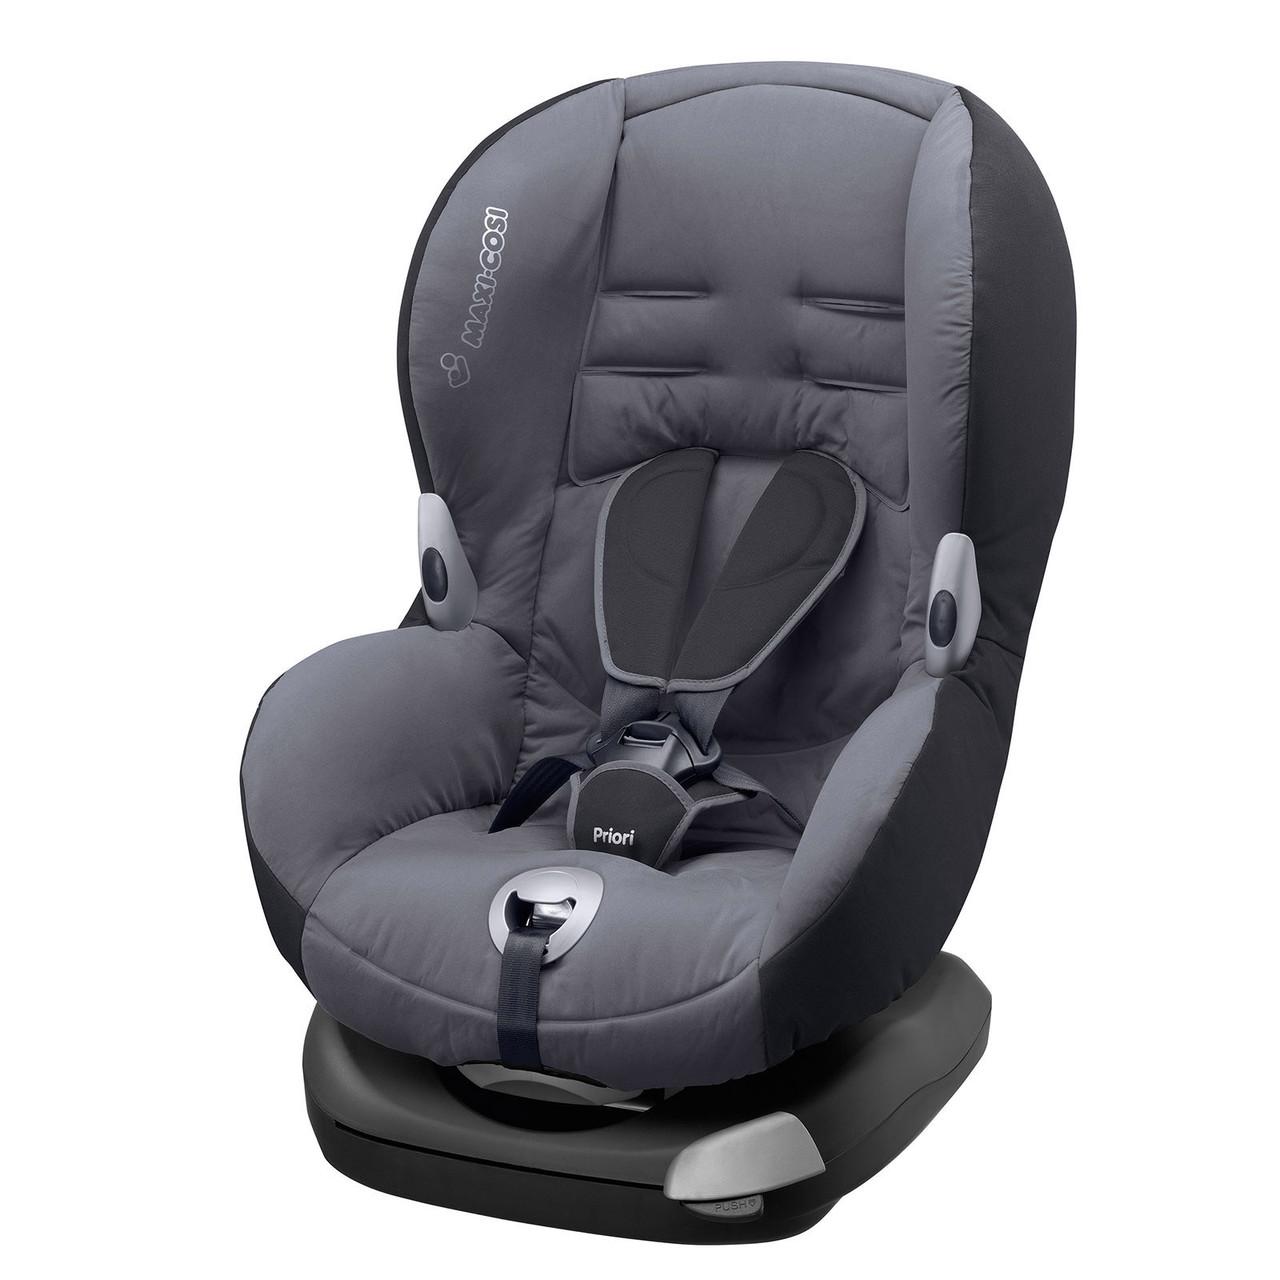 Автокресло Maxi Cosi Priori XP 9-18 кг (64106180) Solid Grey (тёмно-серый)